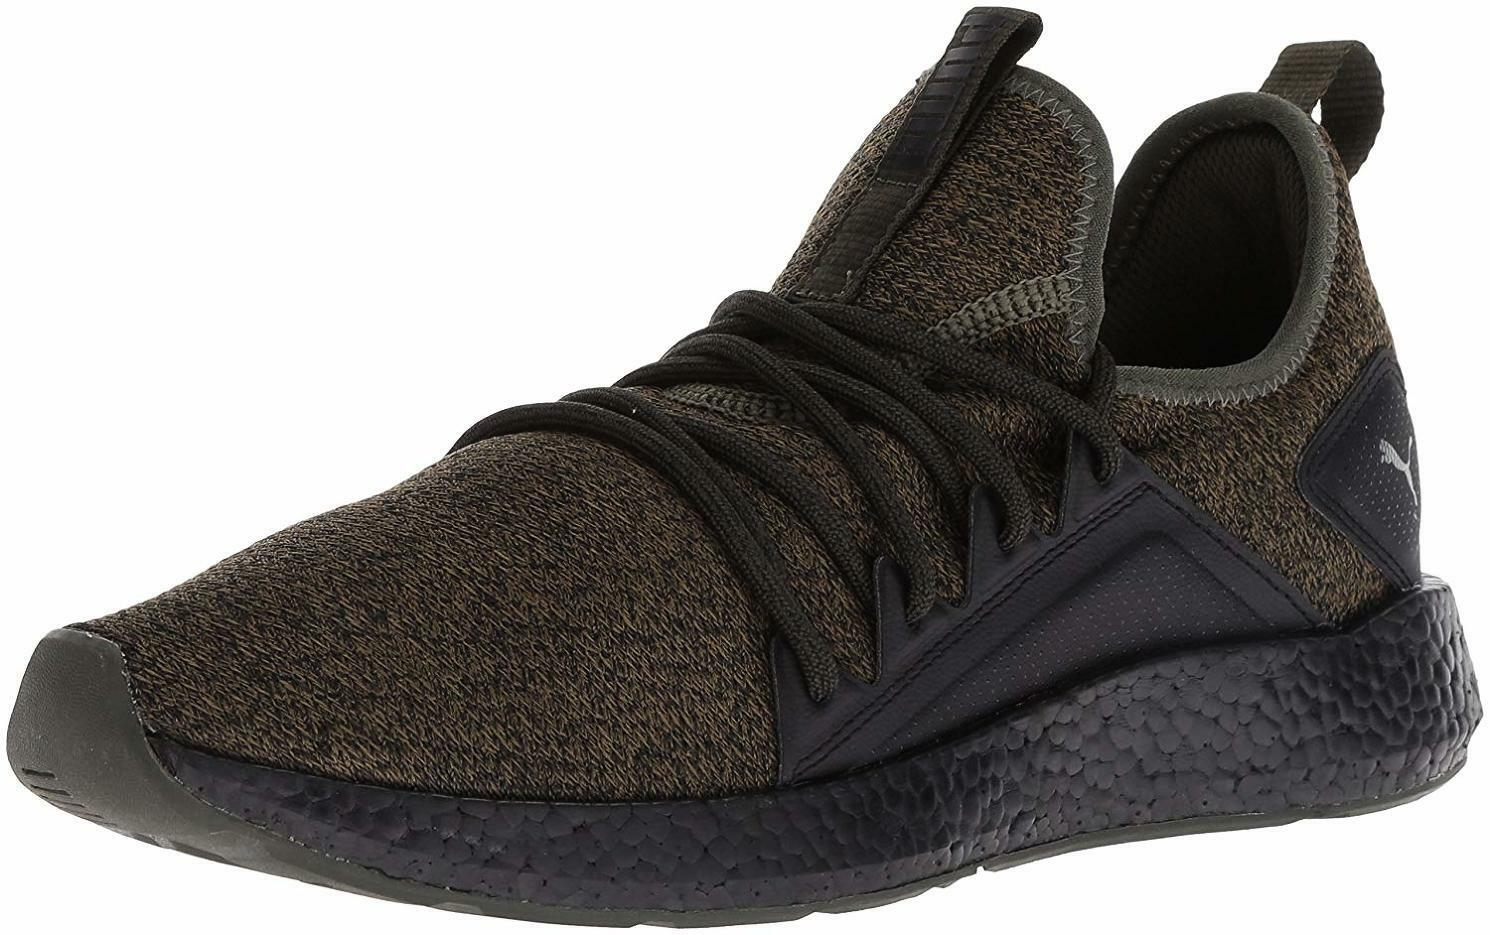 PUMA Men's Nrgy Neko Knit Sneaker - Choose SZ color